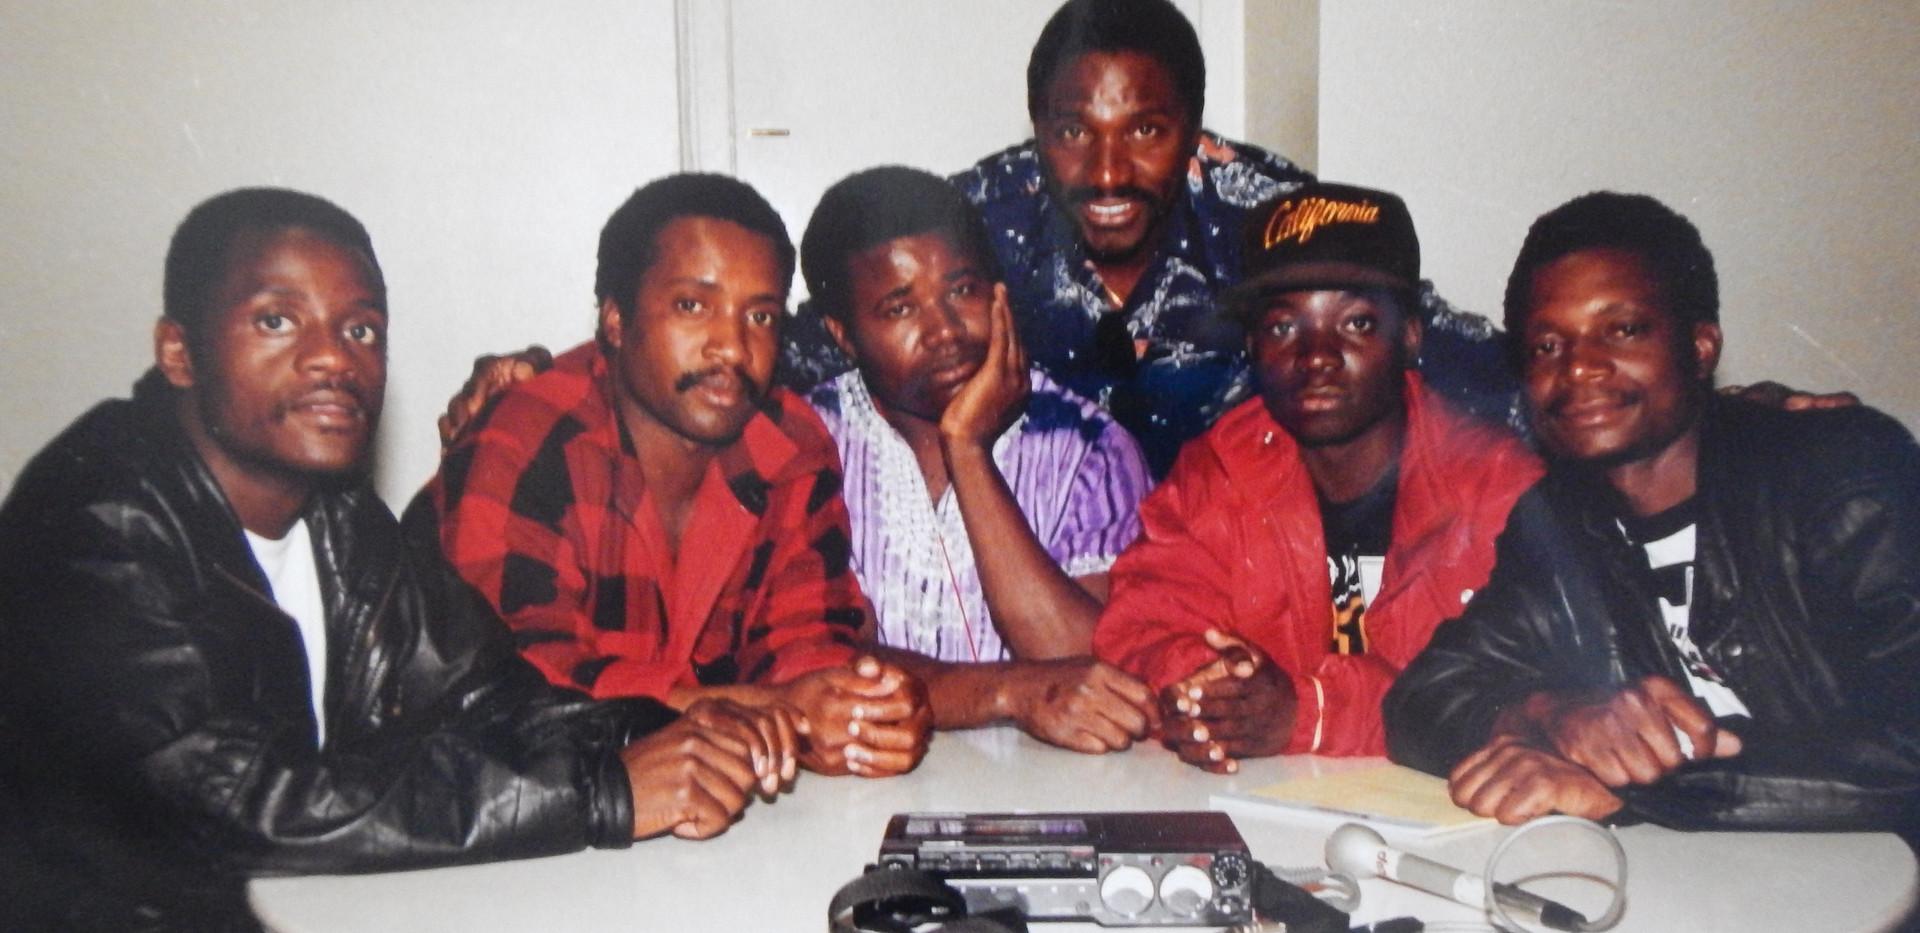 Zimbabwe's 80s super pop group the Bhundu Boys